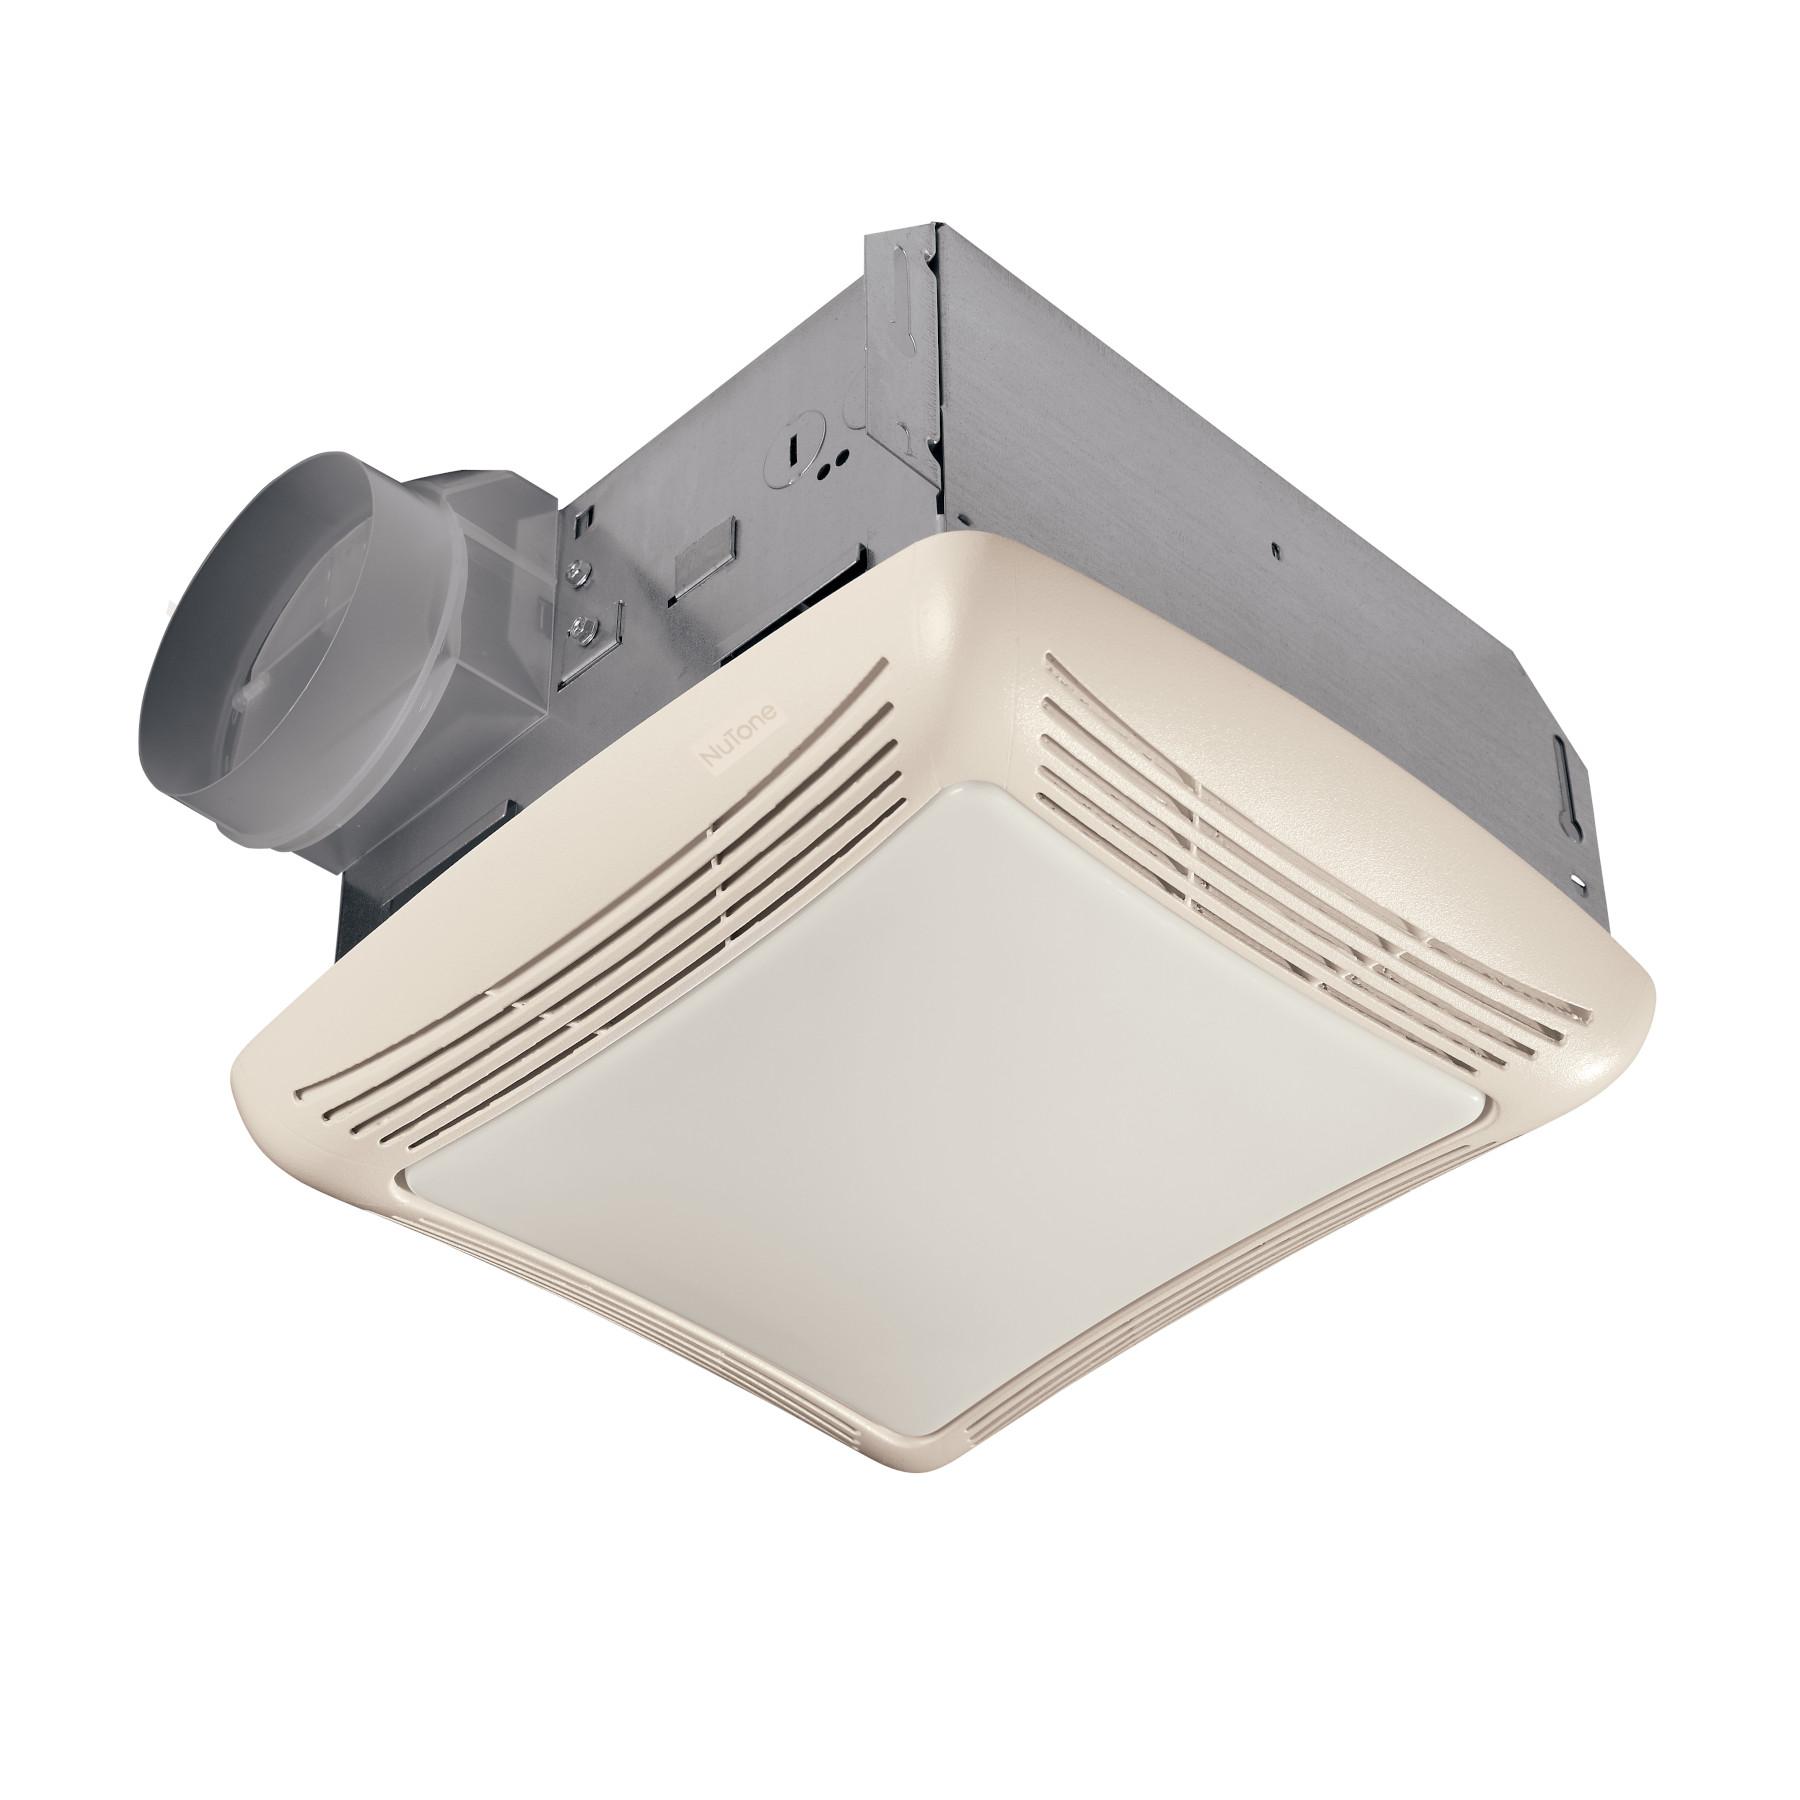 769rl nutone 70 cfm ventilation fan